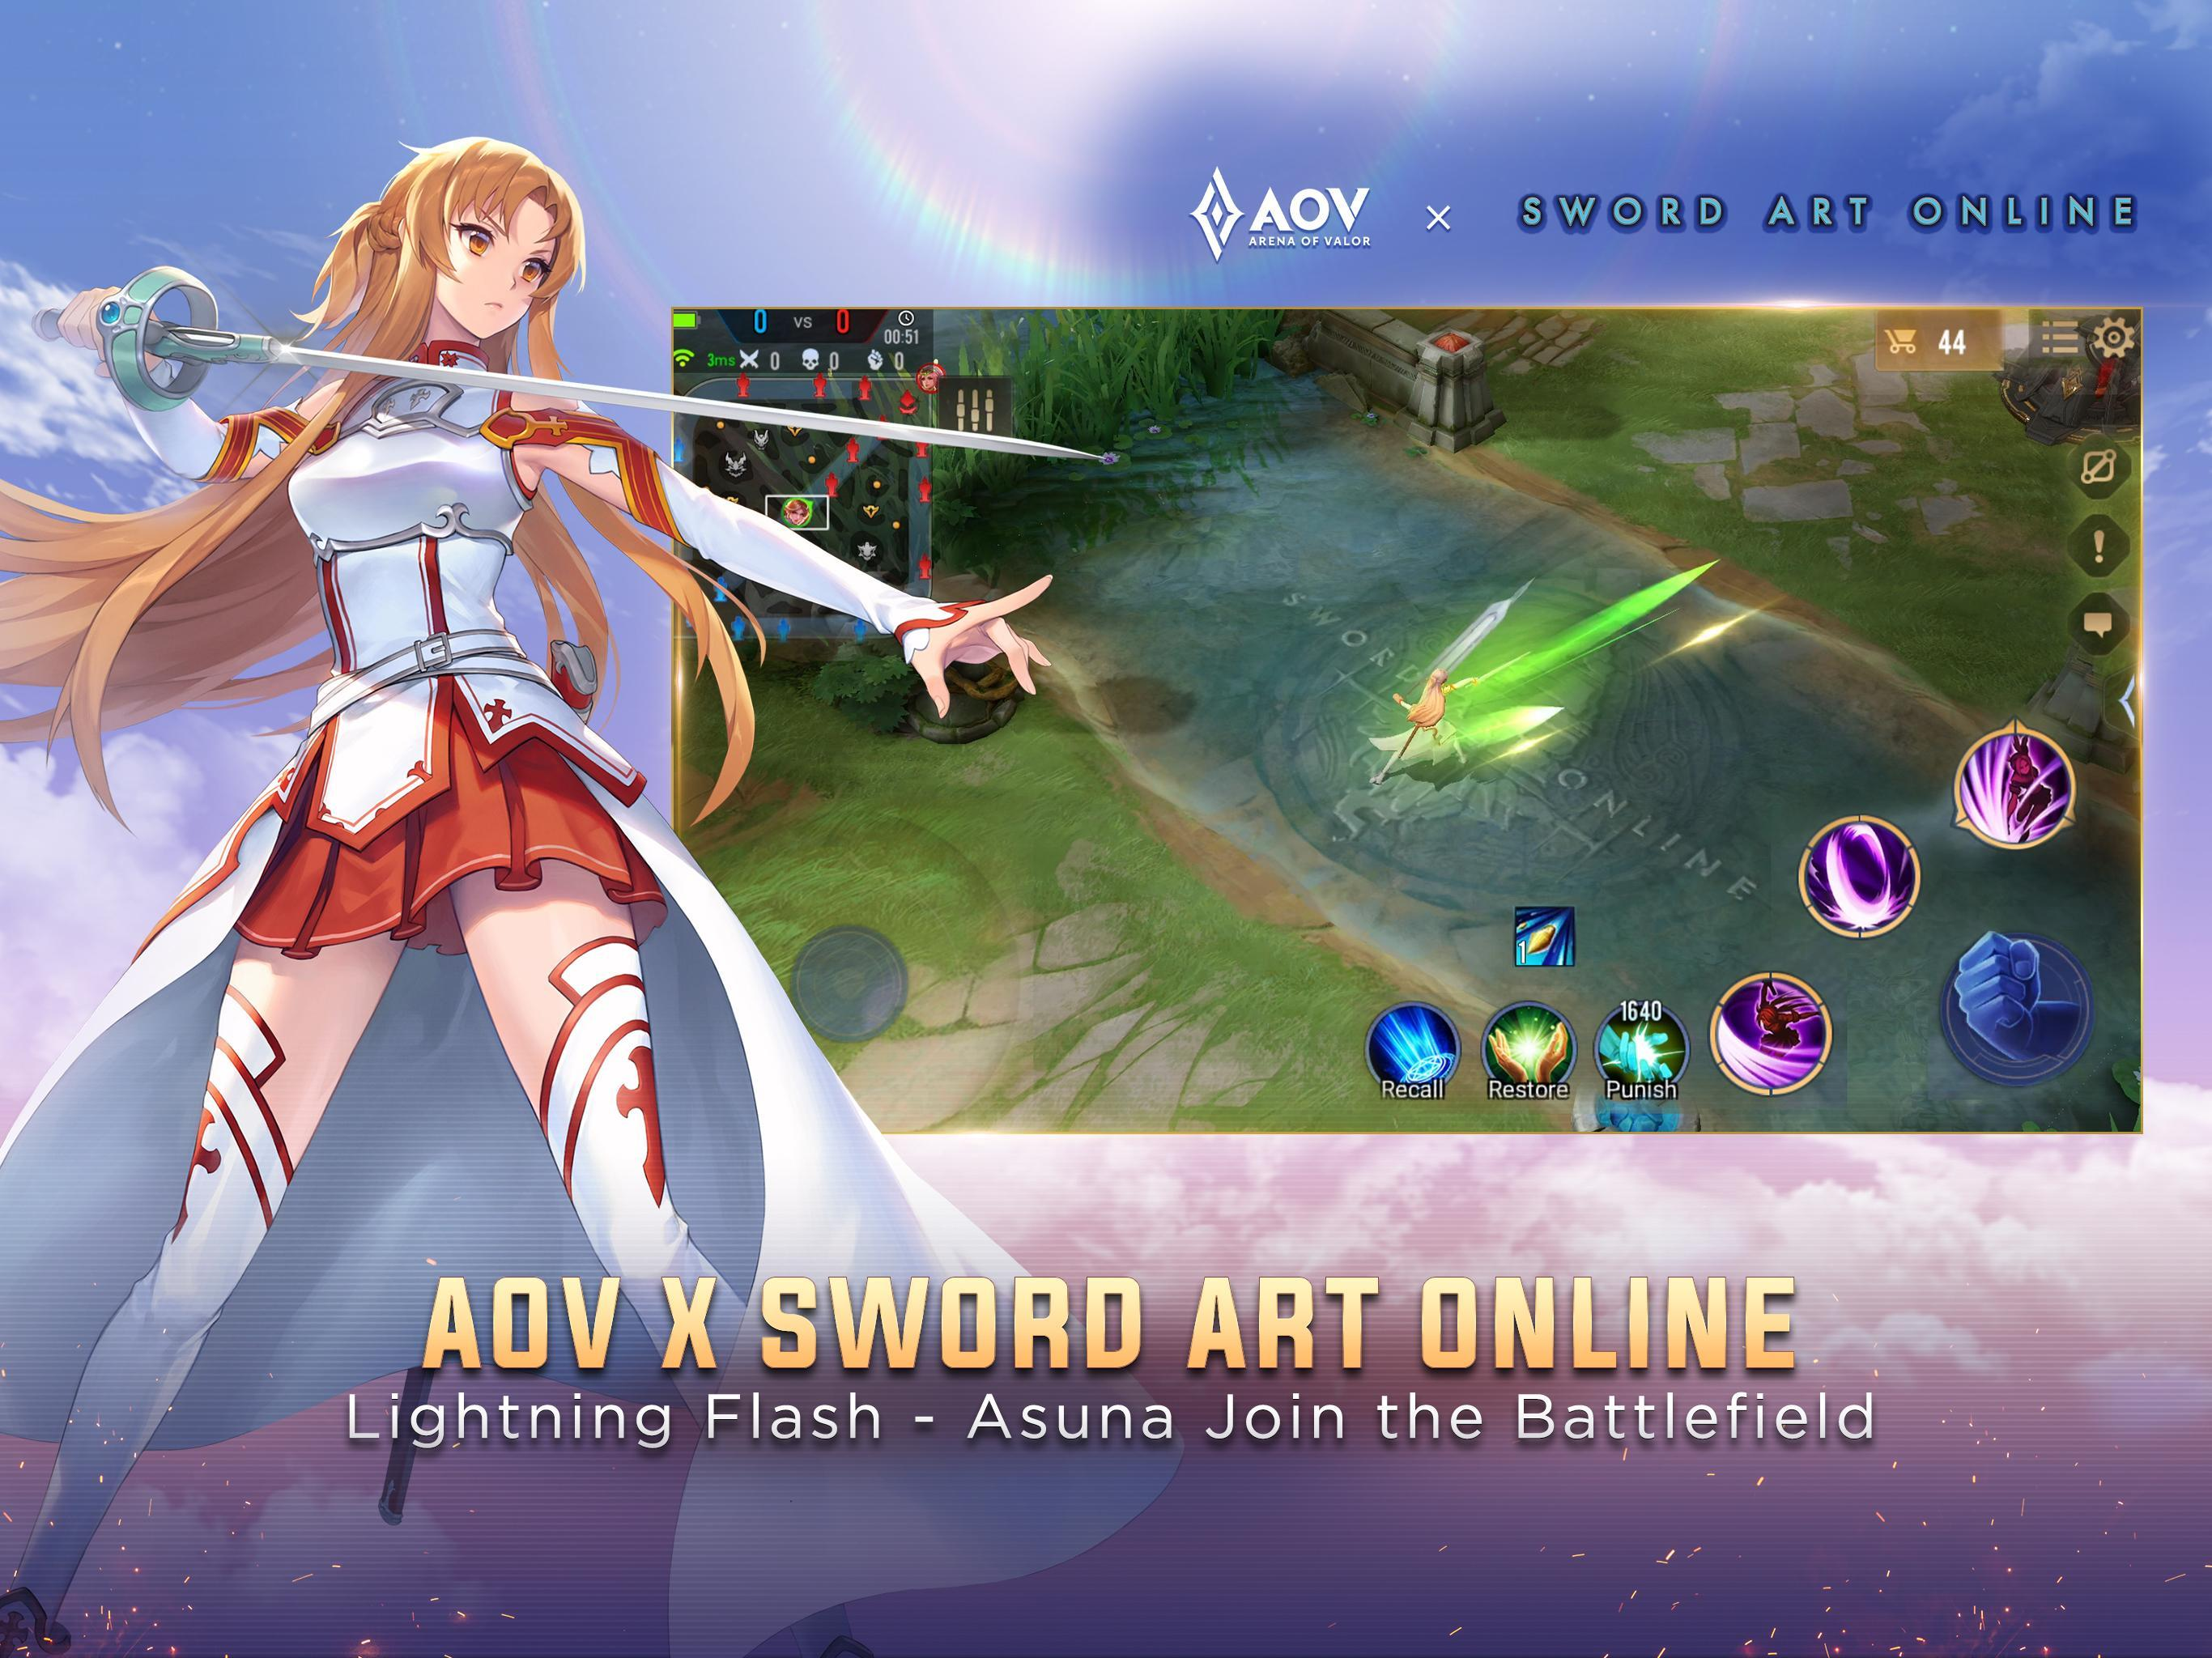 Garena AOV - Arena of Valor: Action MOBA 1.36.1.5 Screenshot 18